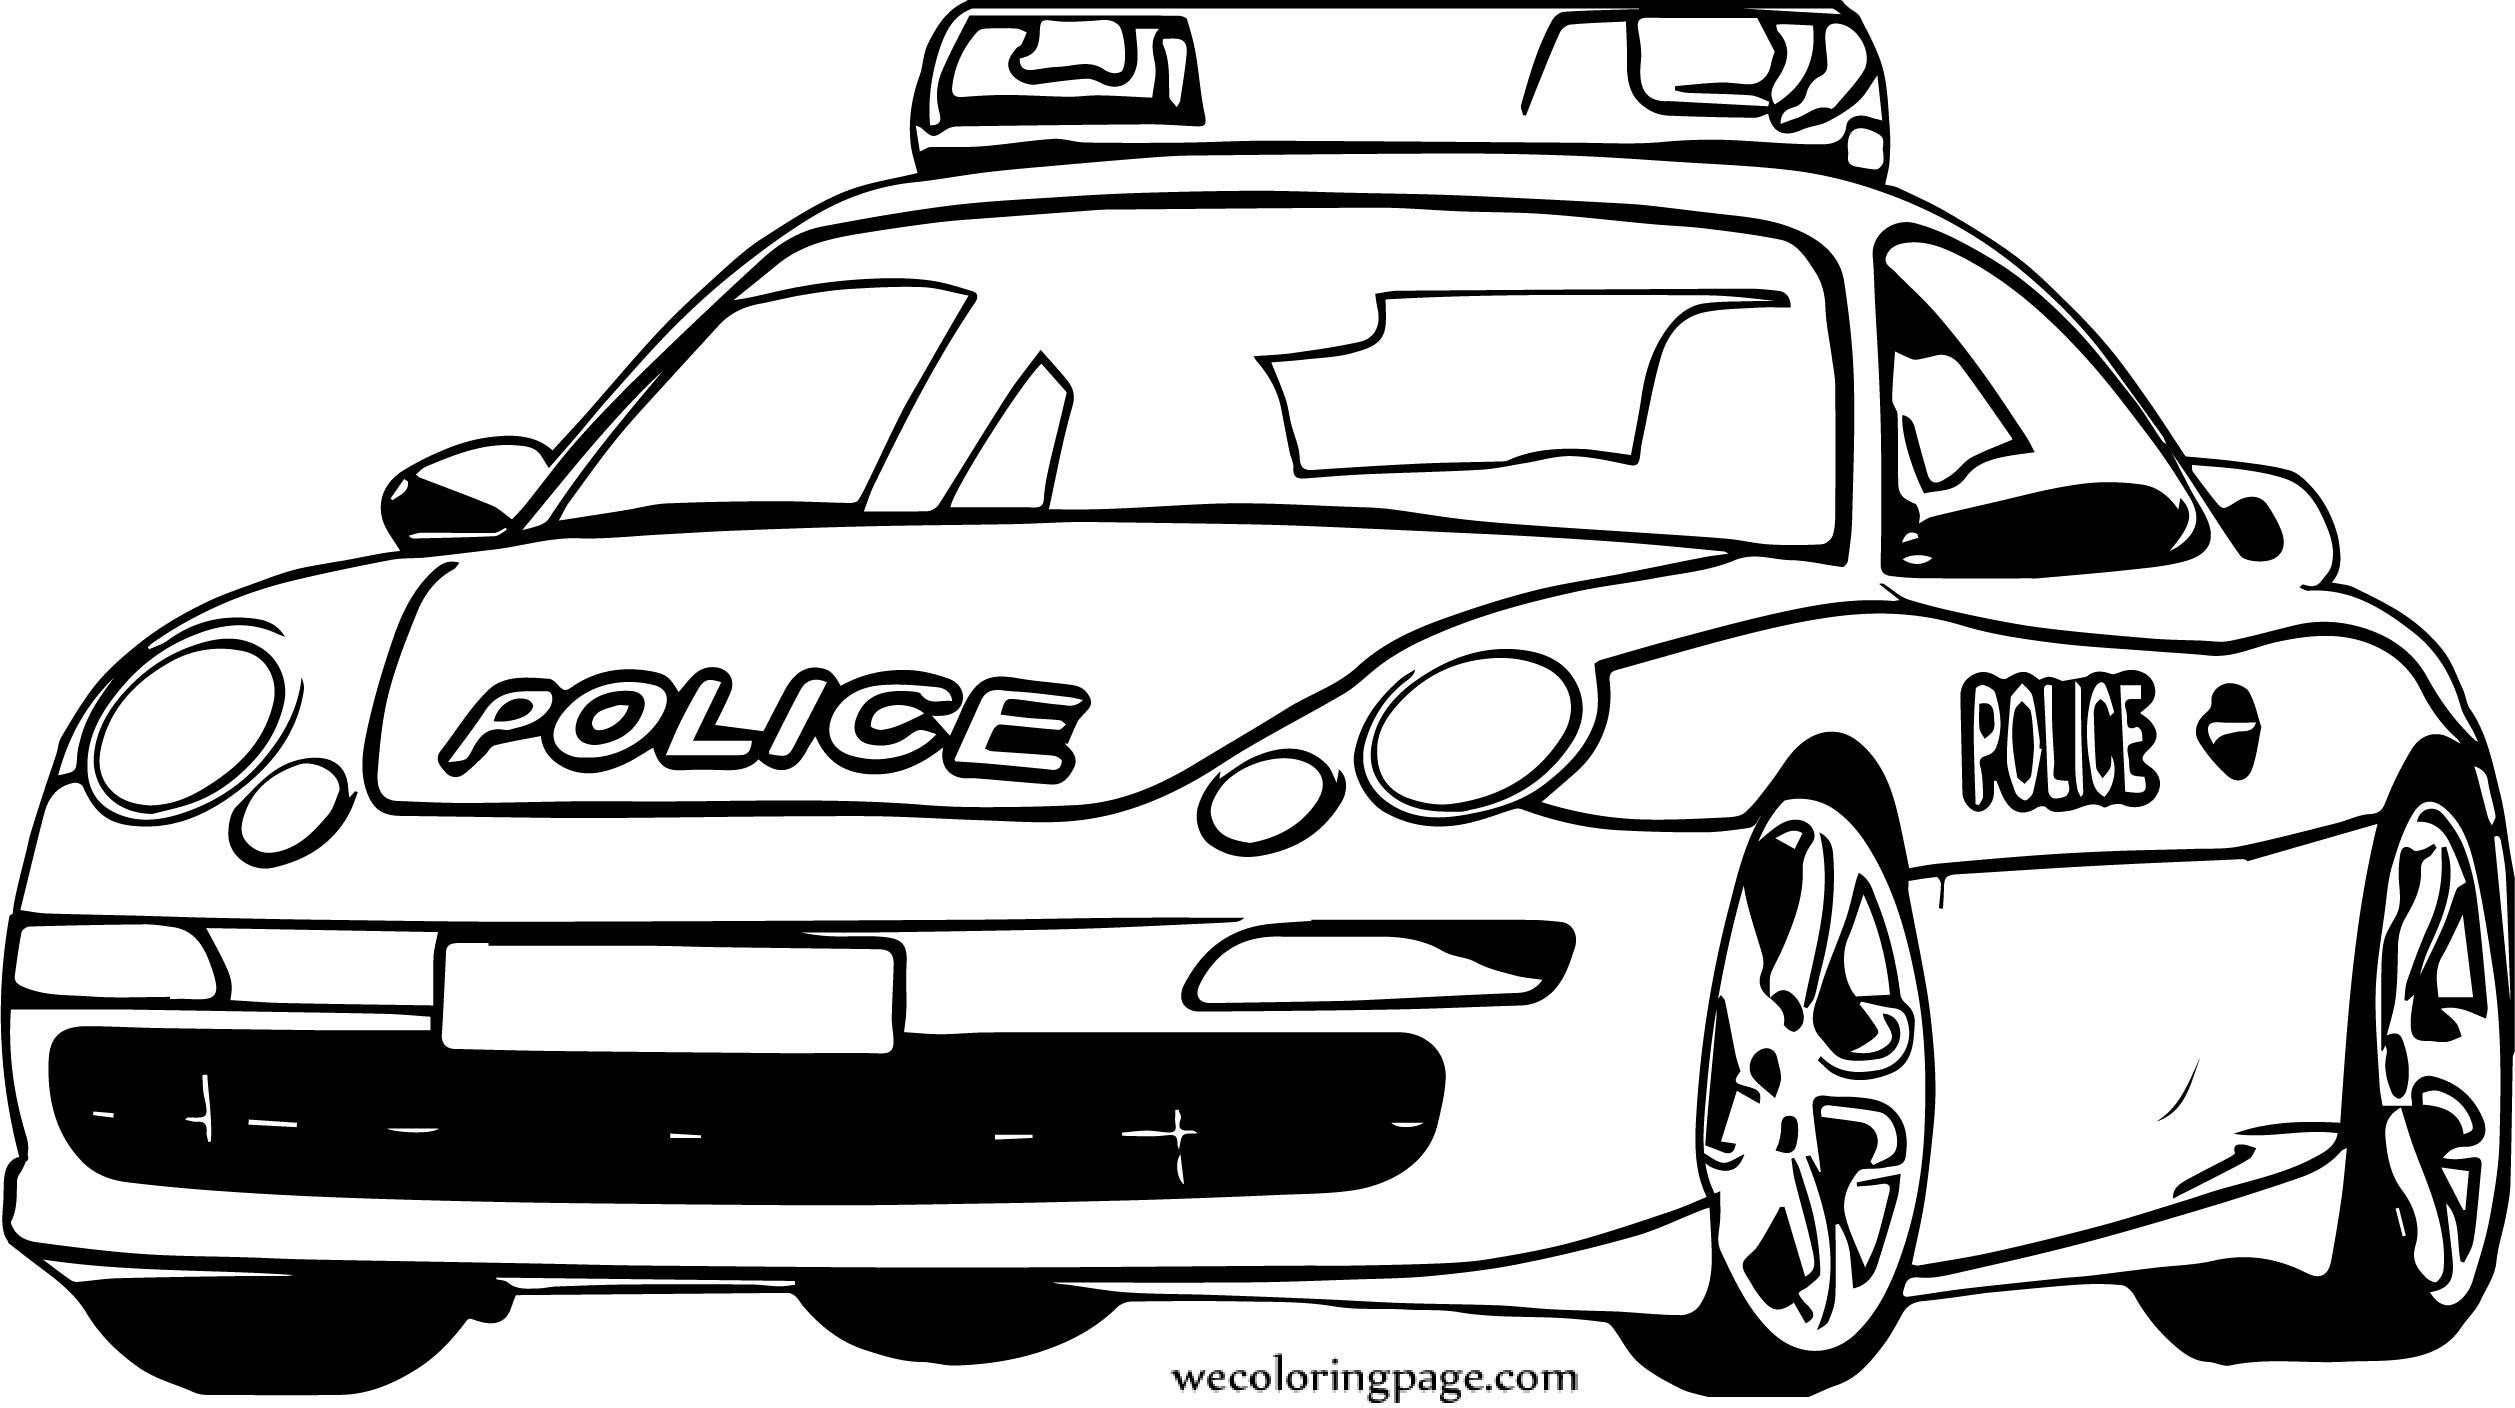 Porsche Police Car Coloring Page Wecoloringpage Com